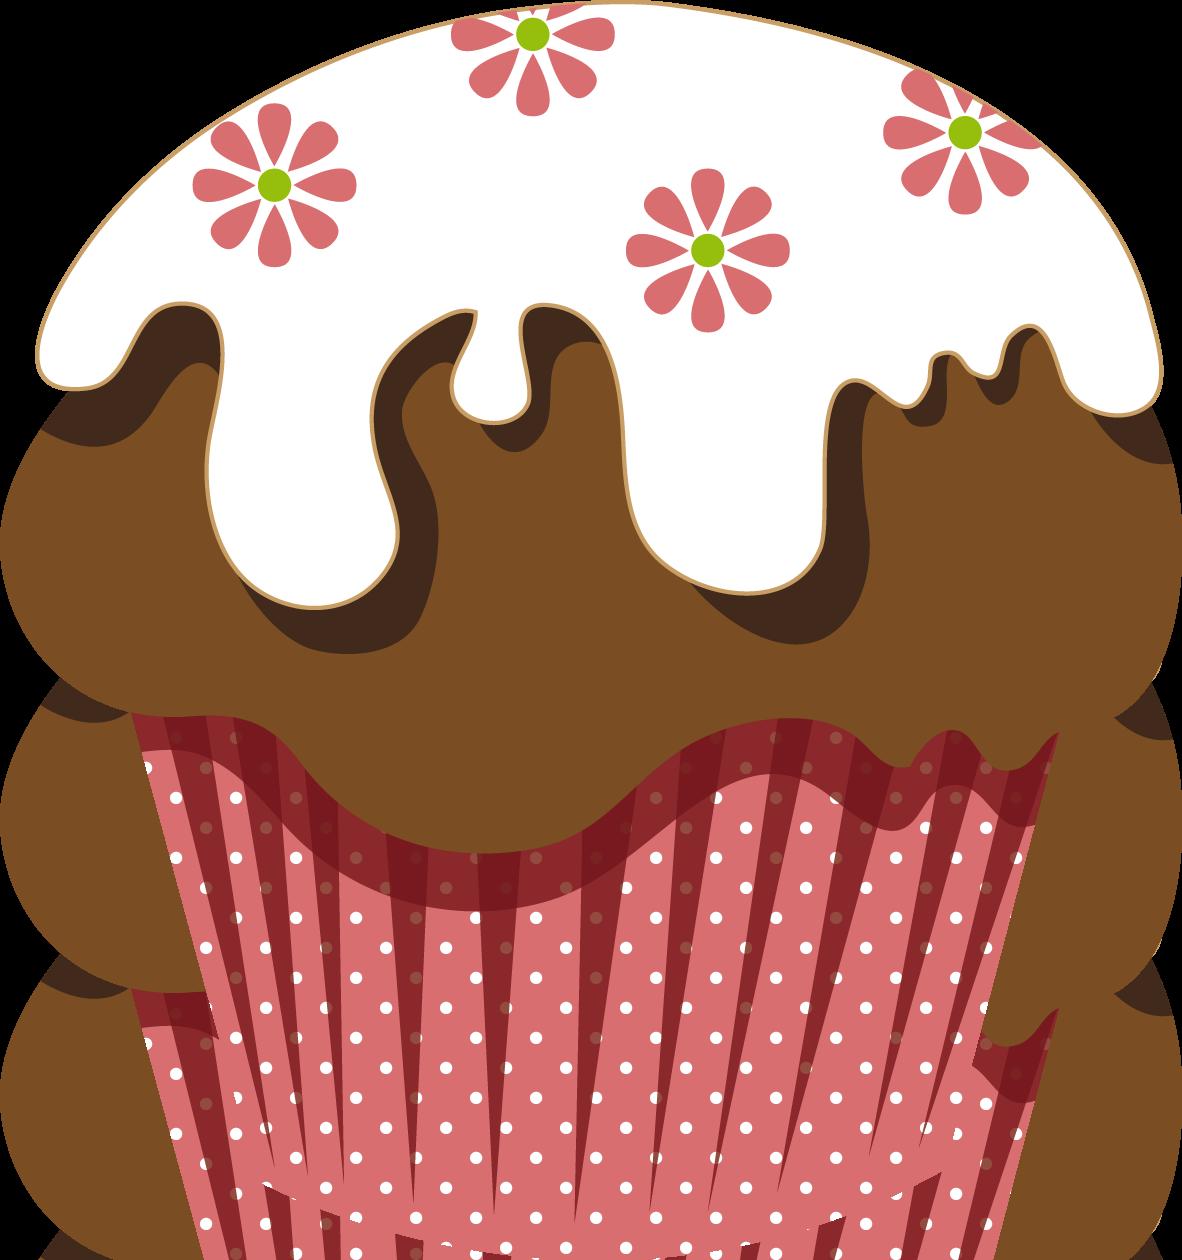 Pin by renee ward. Cupcake clipart scrapbook